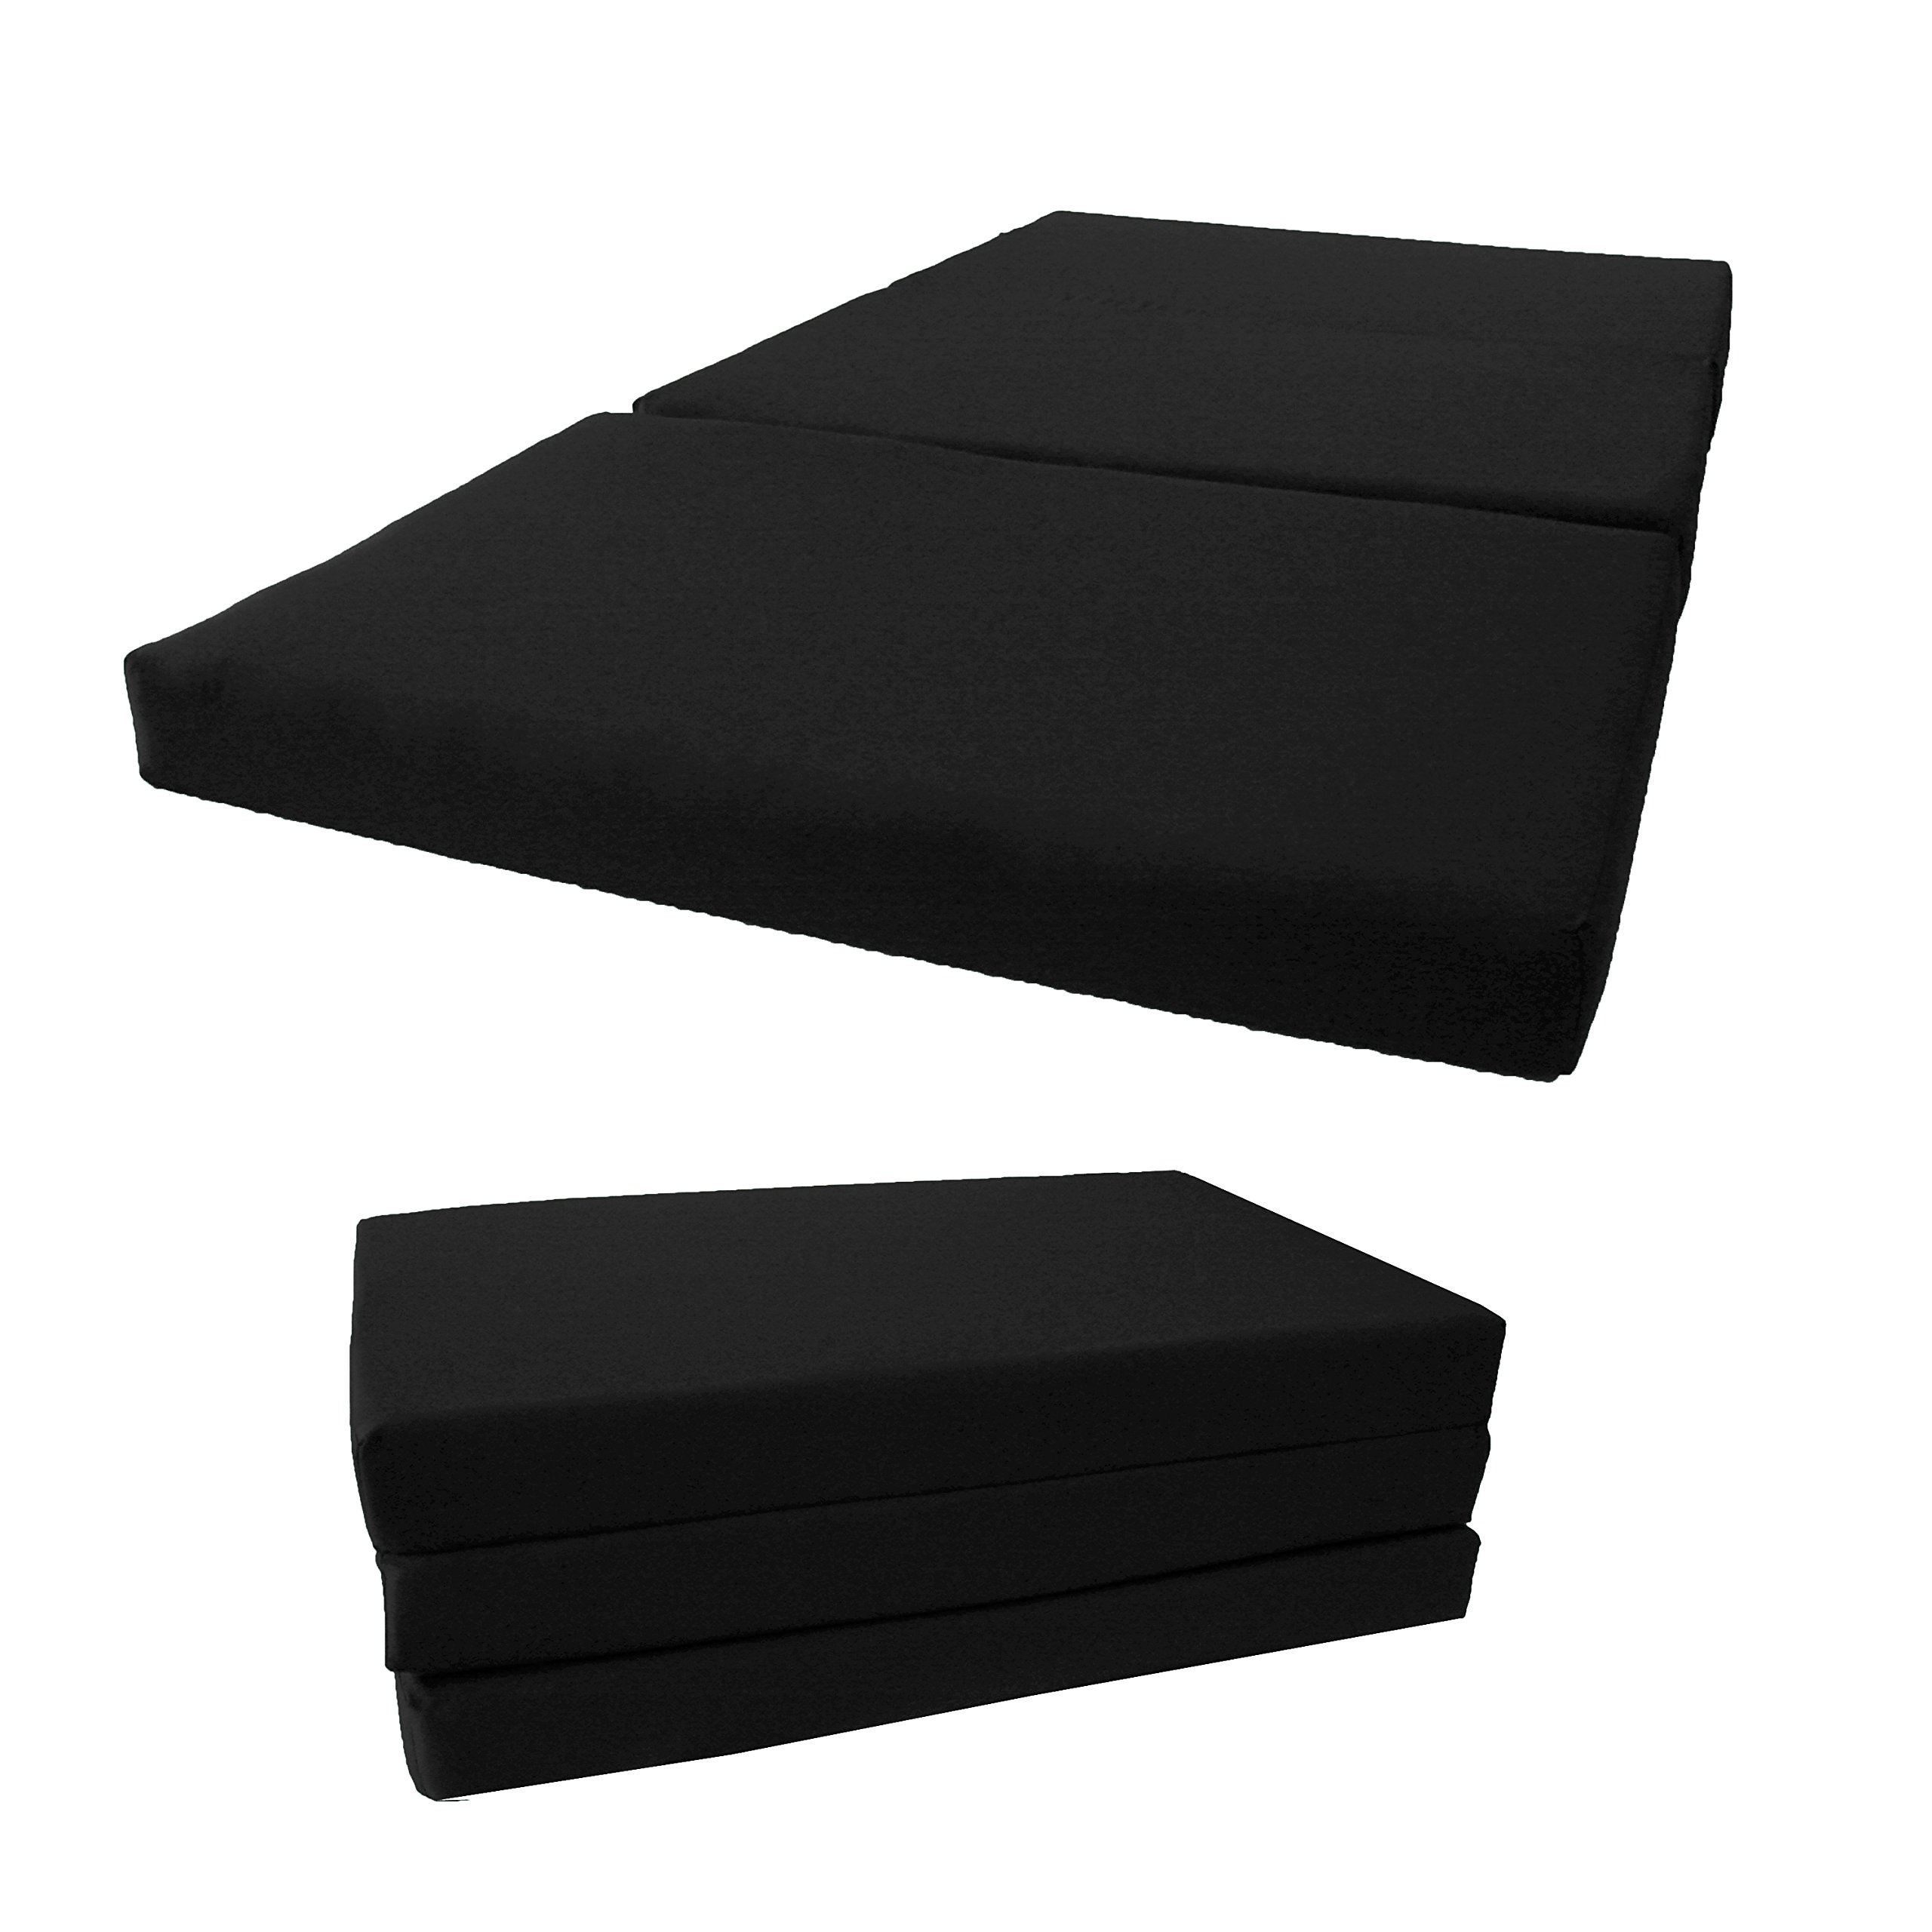 Brand New Shikibuton Tri Fold Foam Beds, Tri-Fold Bed, High Density 1.8 lbs Foam, Twin Size, Full, Queen Folding Mattresses. (Queen Size 4x60x80, Black)